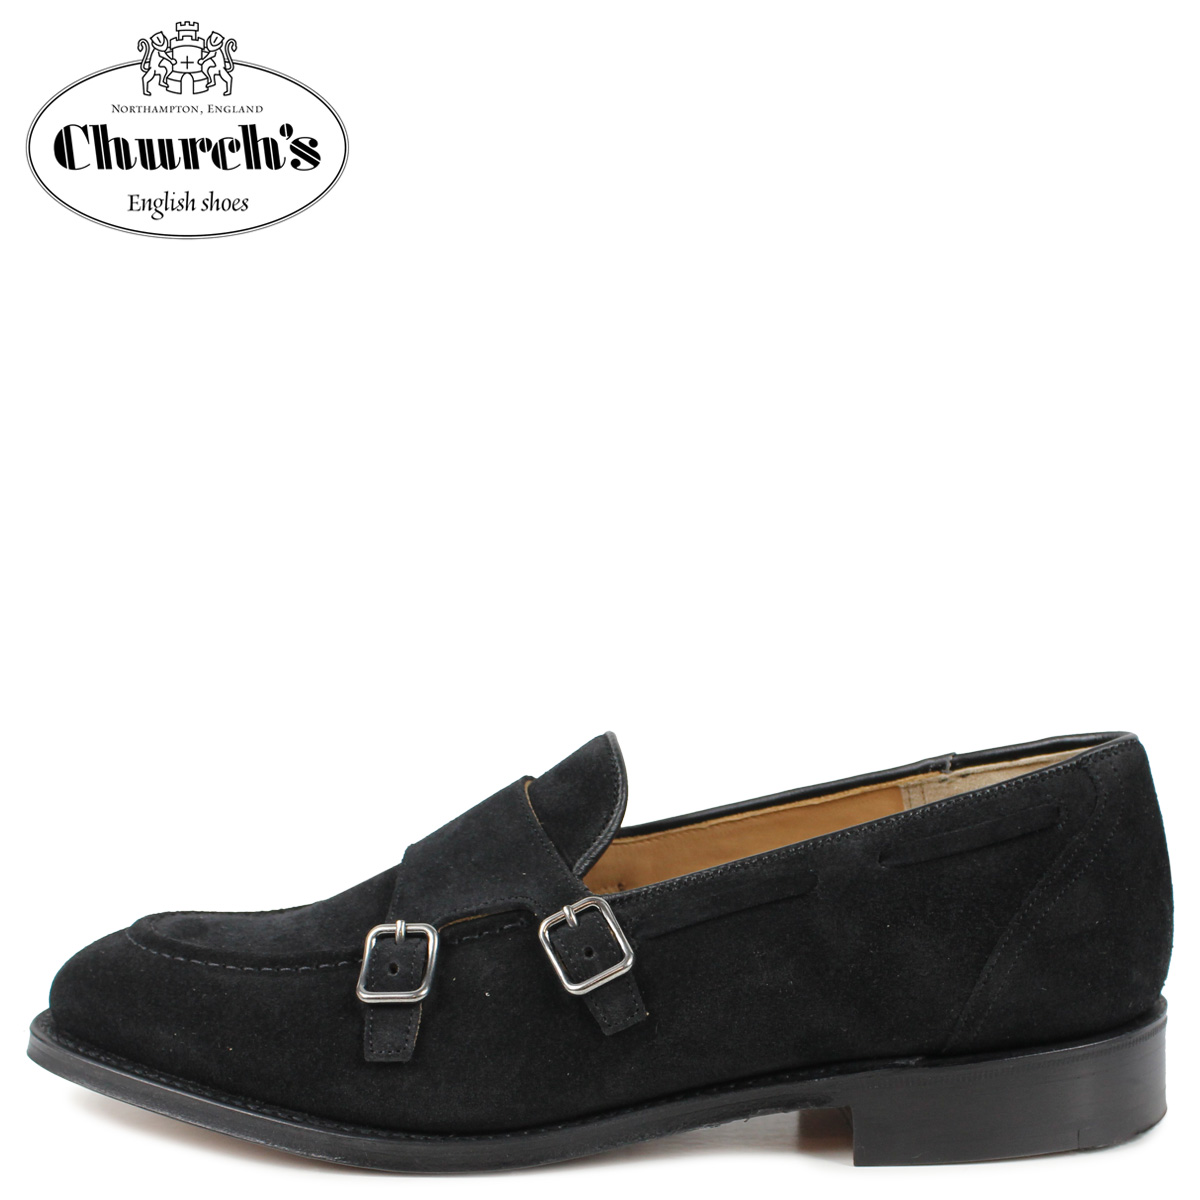 Churchs チャーチ クラットフォード モンクストラップ ローファー メンズ CLATFORD ブラック 黒 EDB080